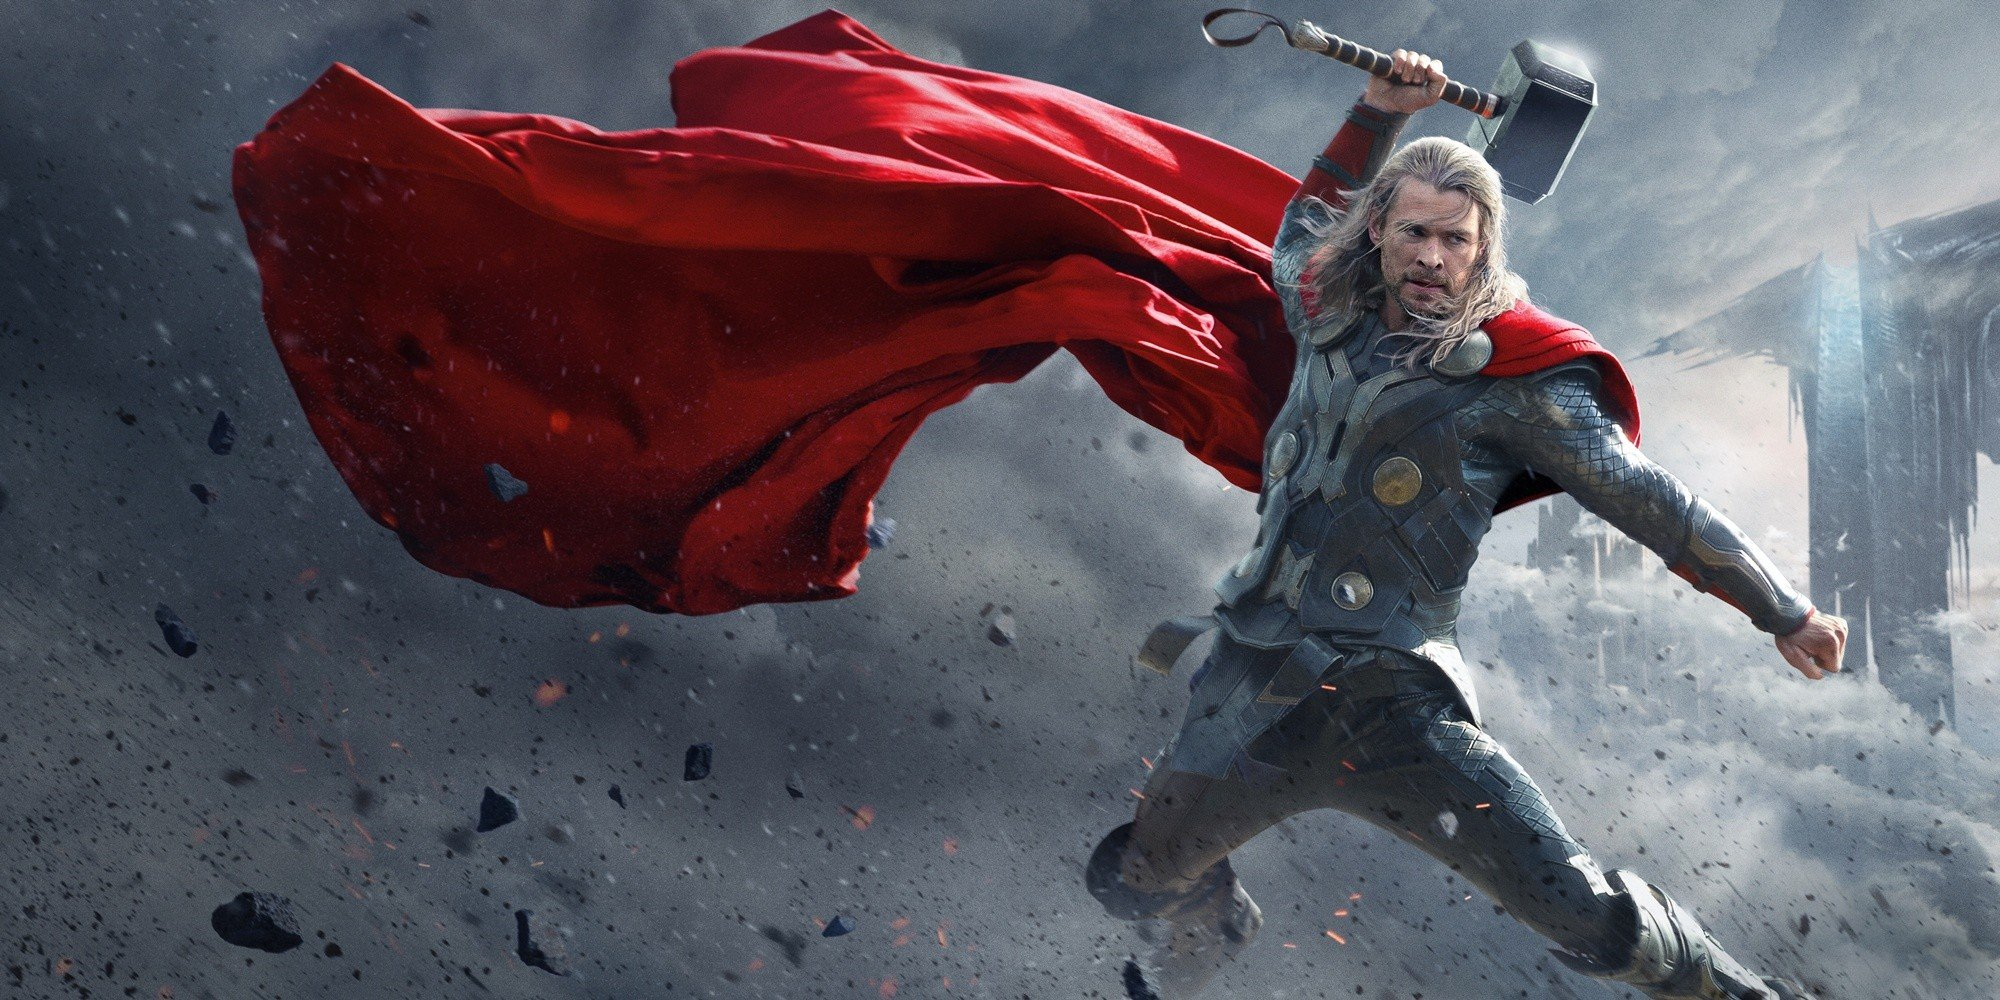 [Iron Studios] Diorama The Avengers: Thor Statue 1/6 scale - Página 7 Thor-the-dark-world10